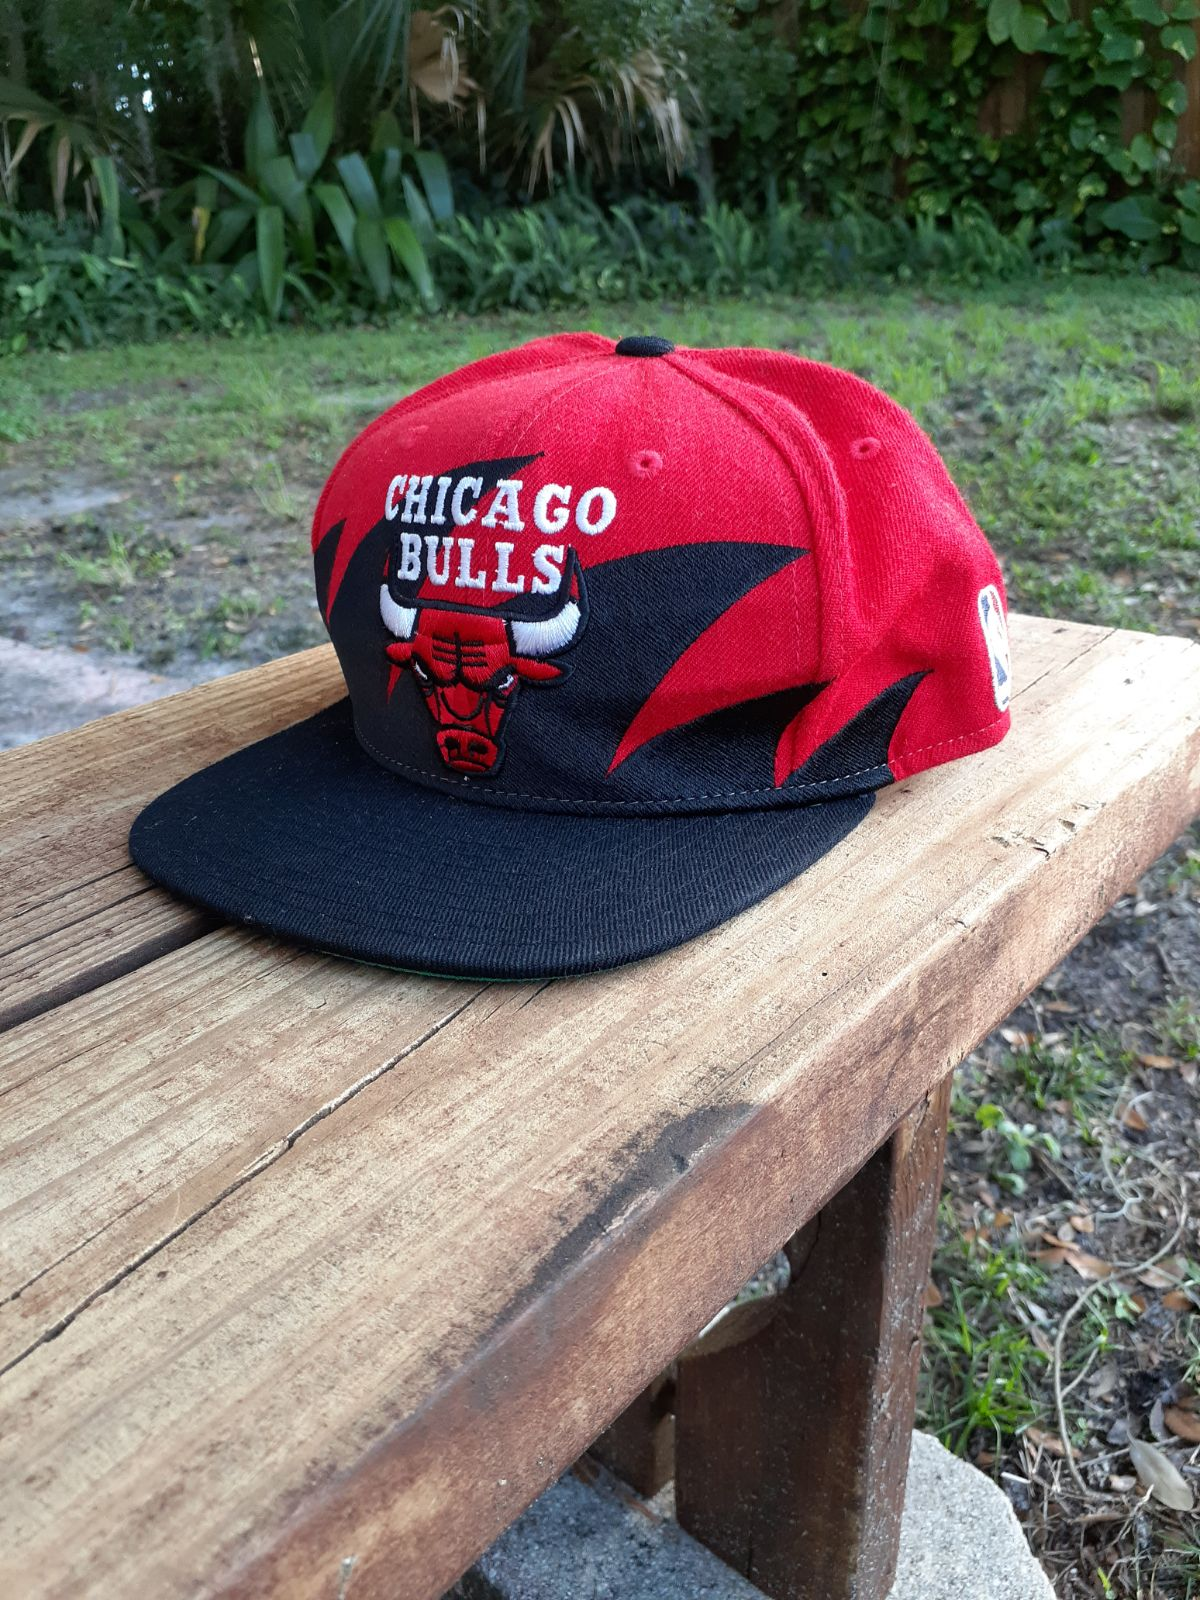 Vintage 90s Chicago Bulls Snapback